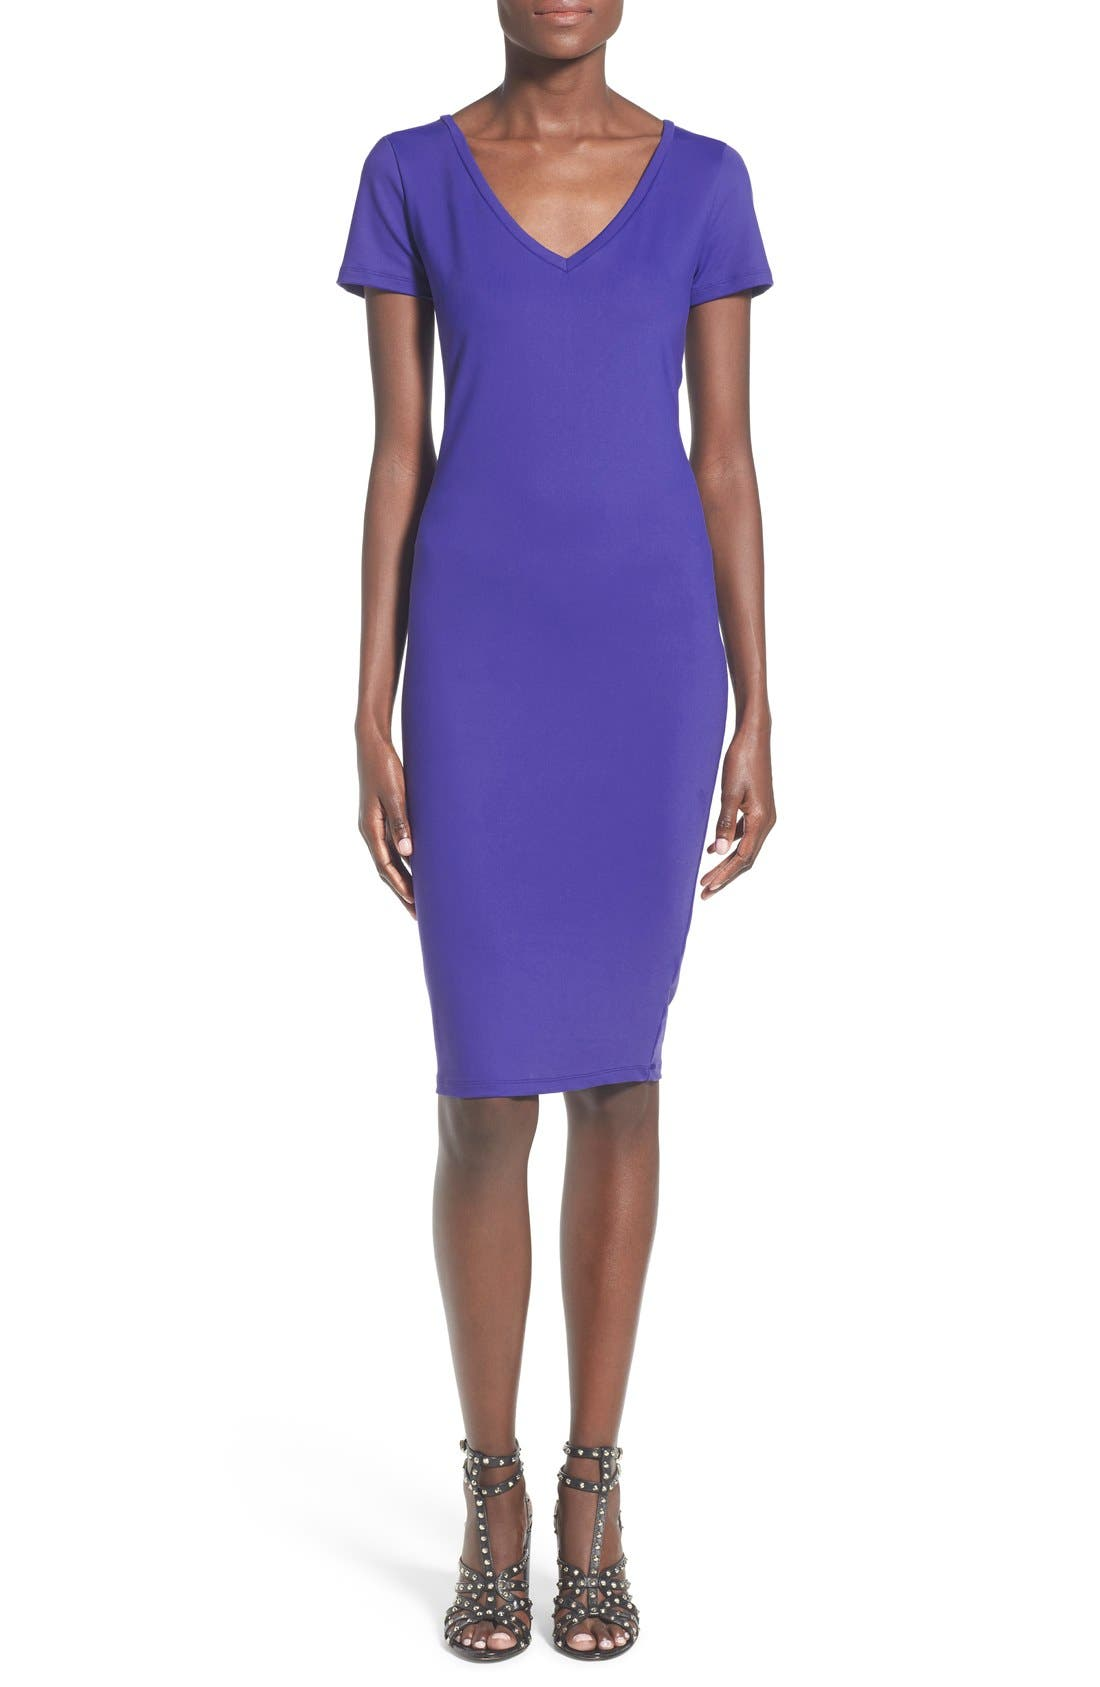 Alternate Image 1 Selected - Leith V-Neck Body-Con Dress